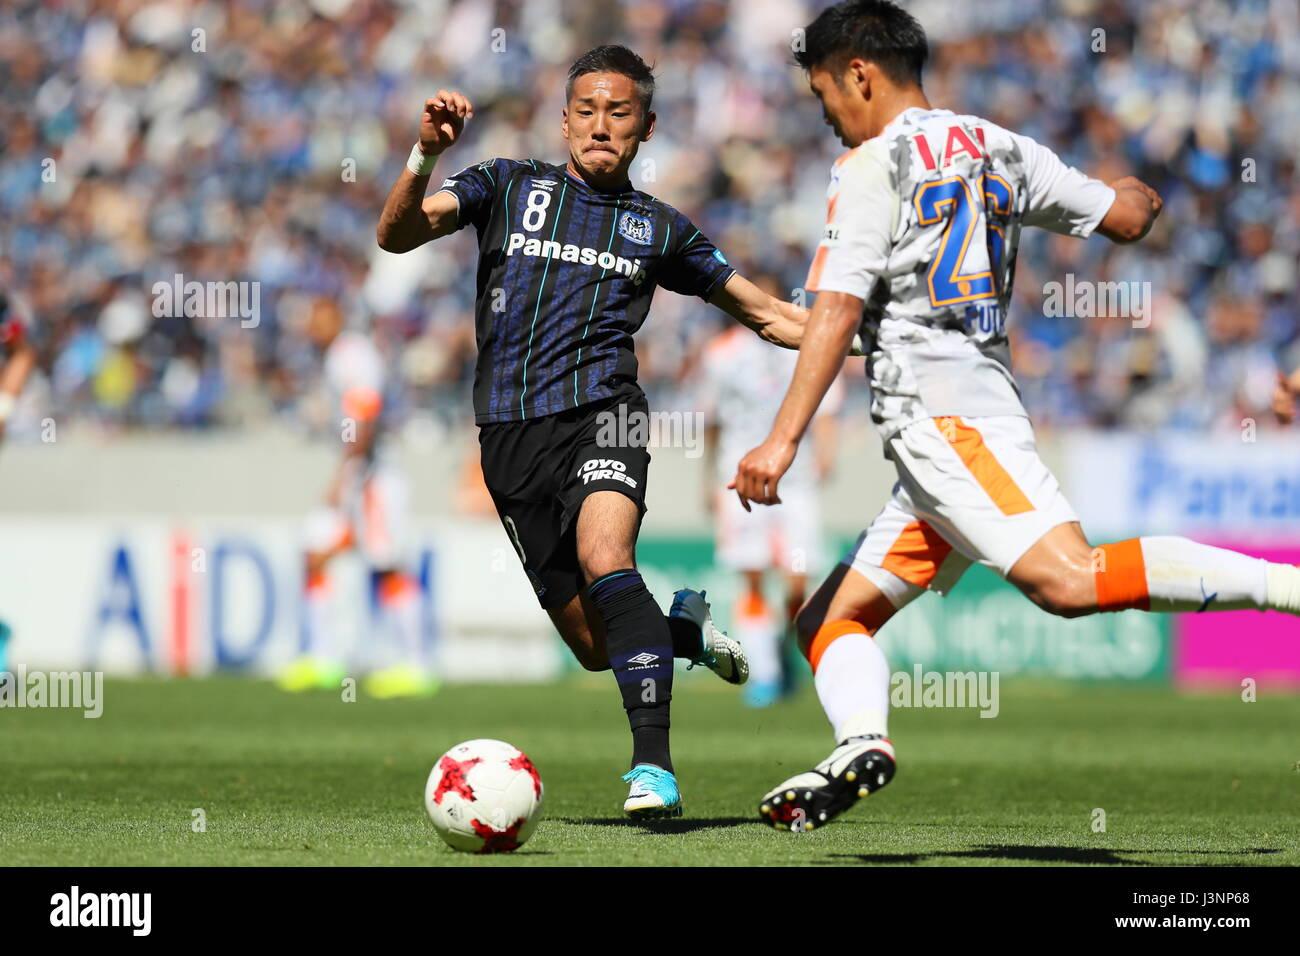 Yosuke Ideguchi Gamba May 5 2017 Football Soccer 2017 J1 Stock Photo Alamy